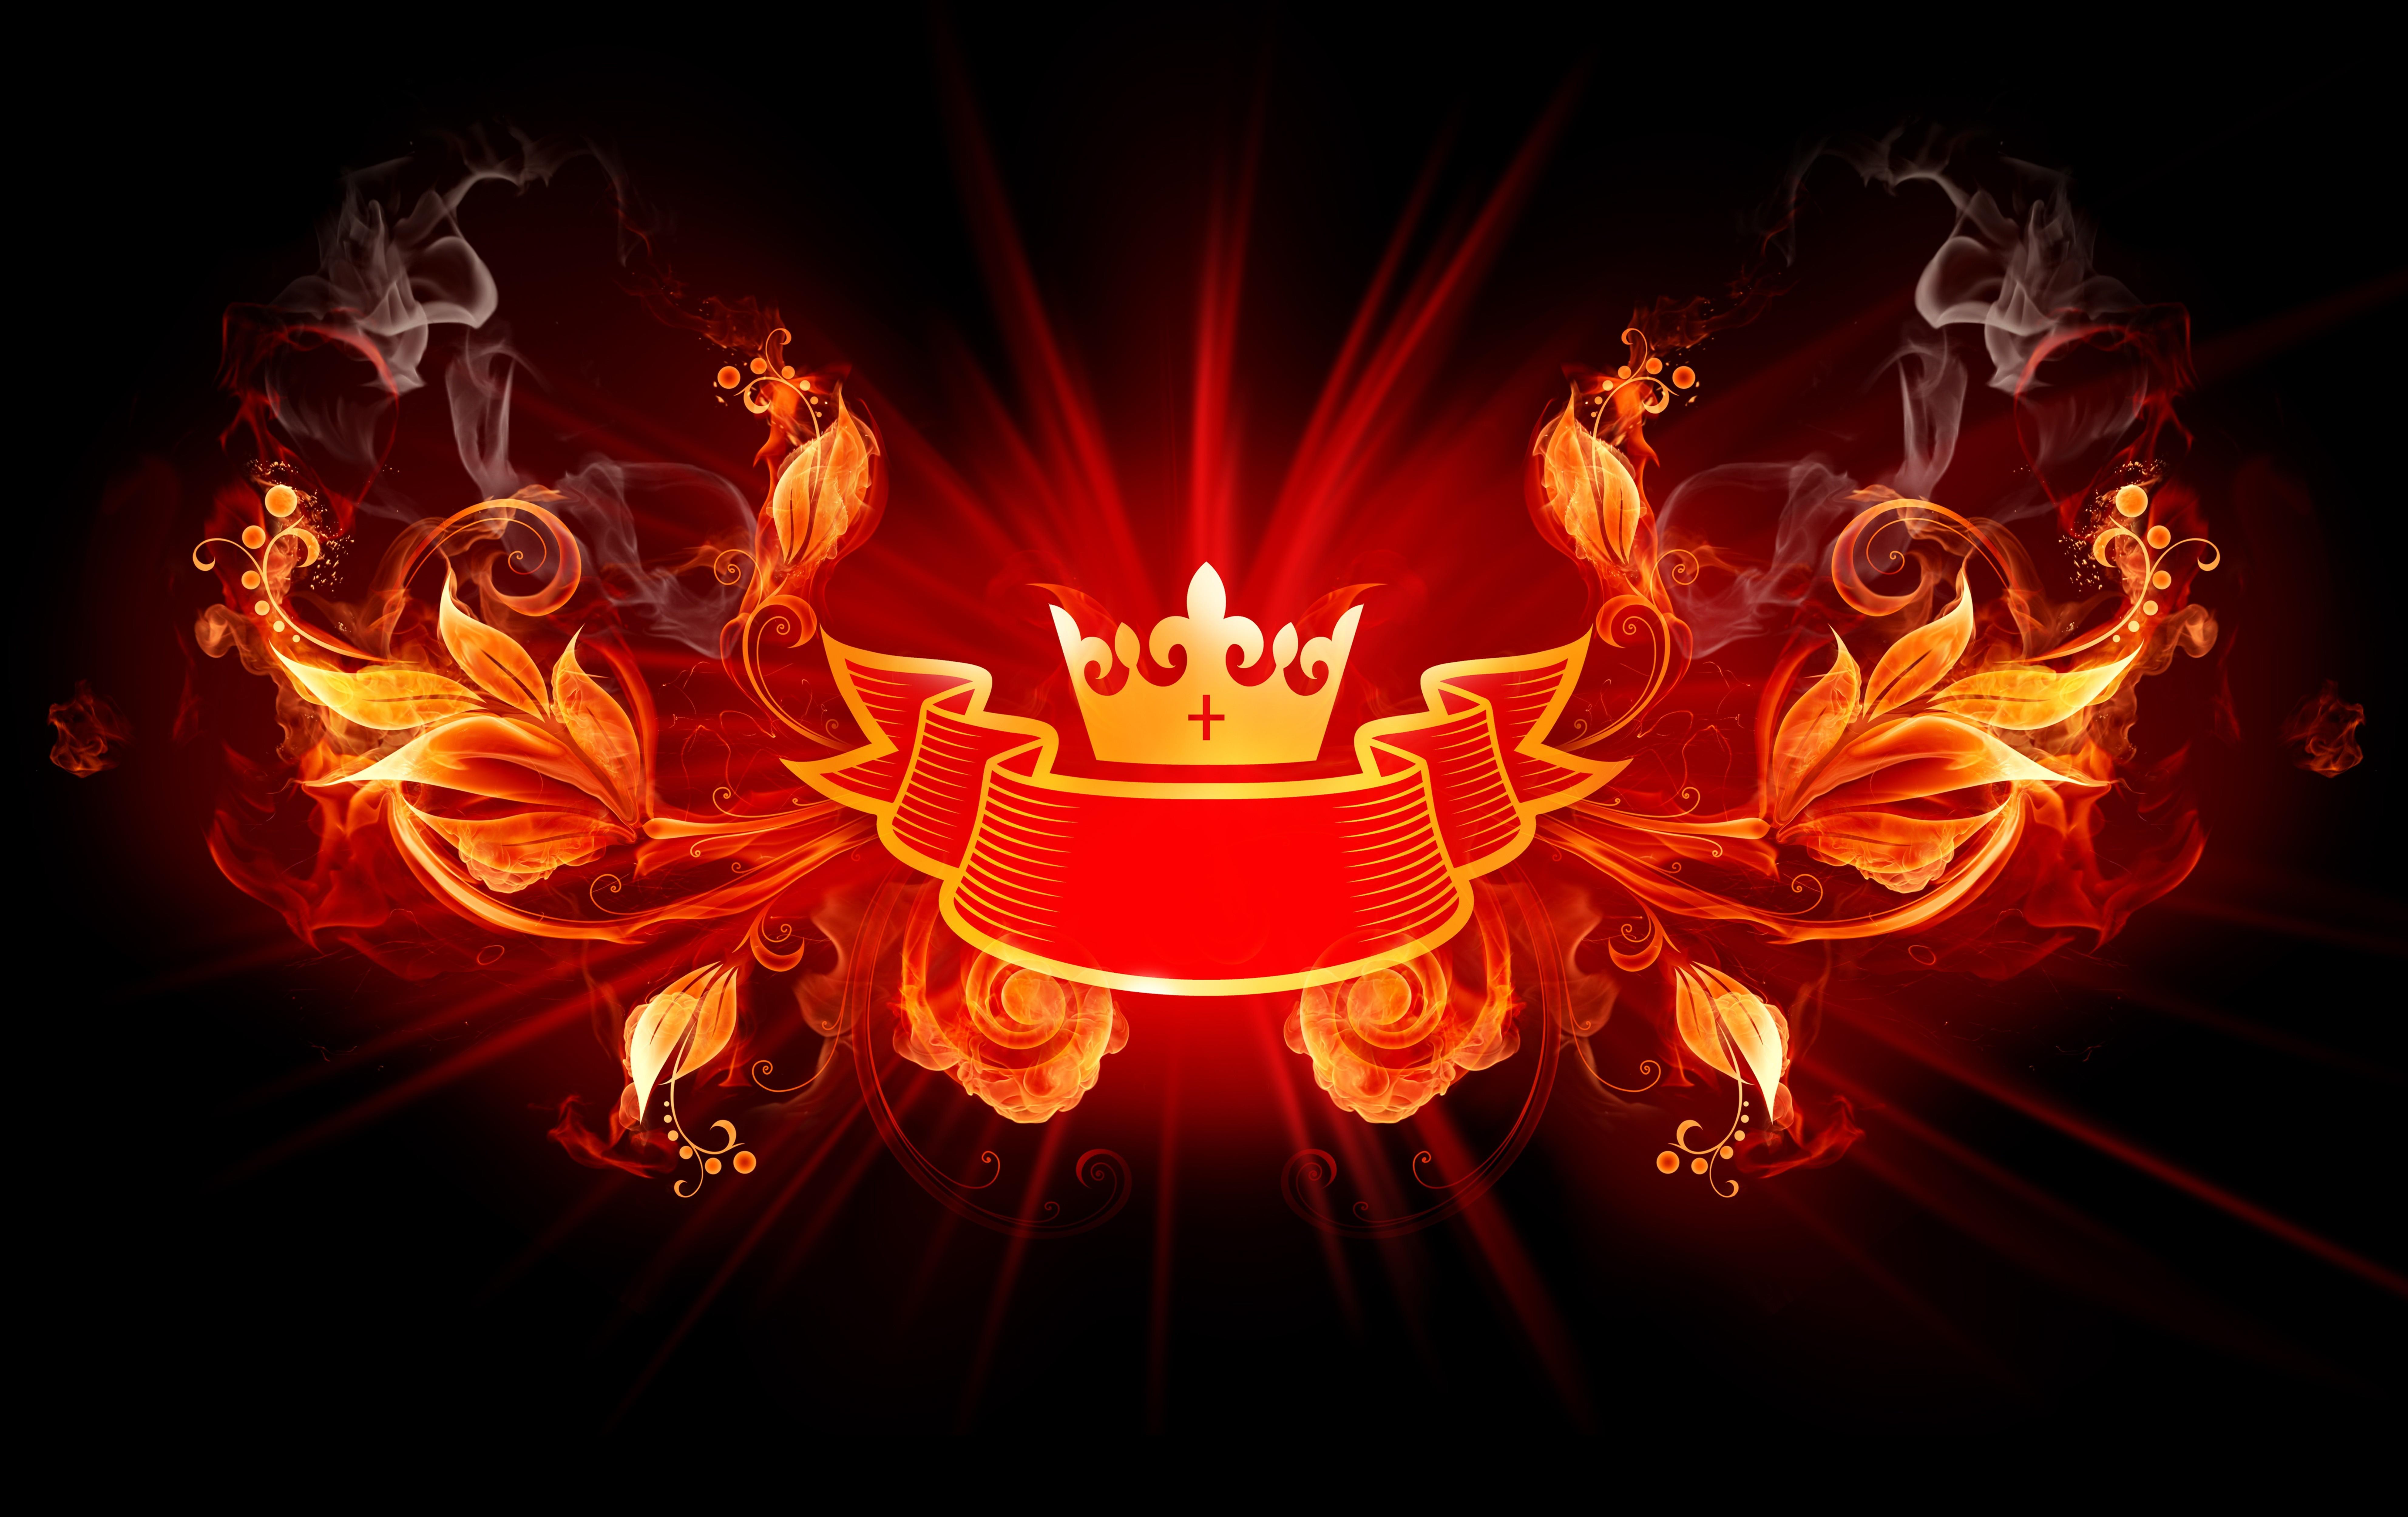 General 7935x5000 digital art fire crown floral curtains plants leaves swirls